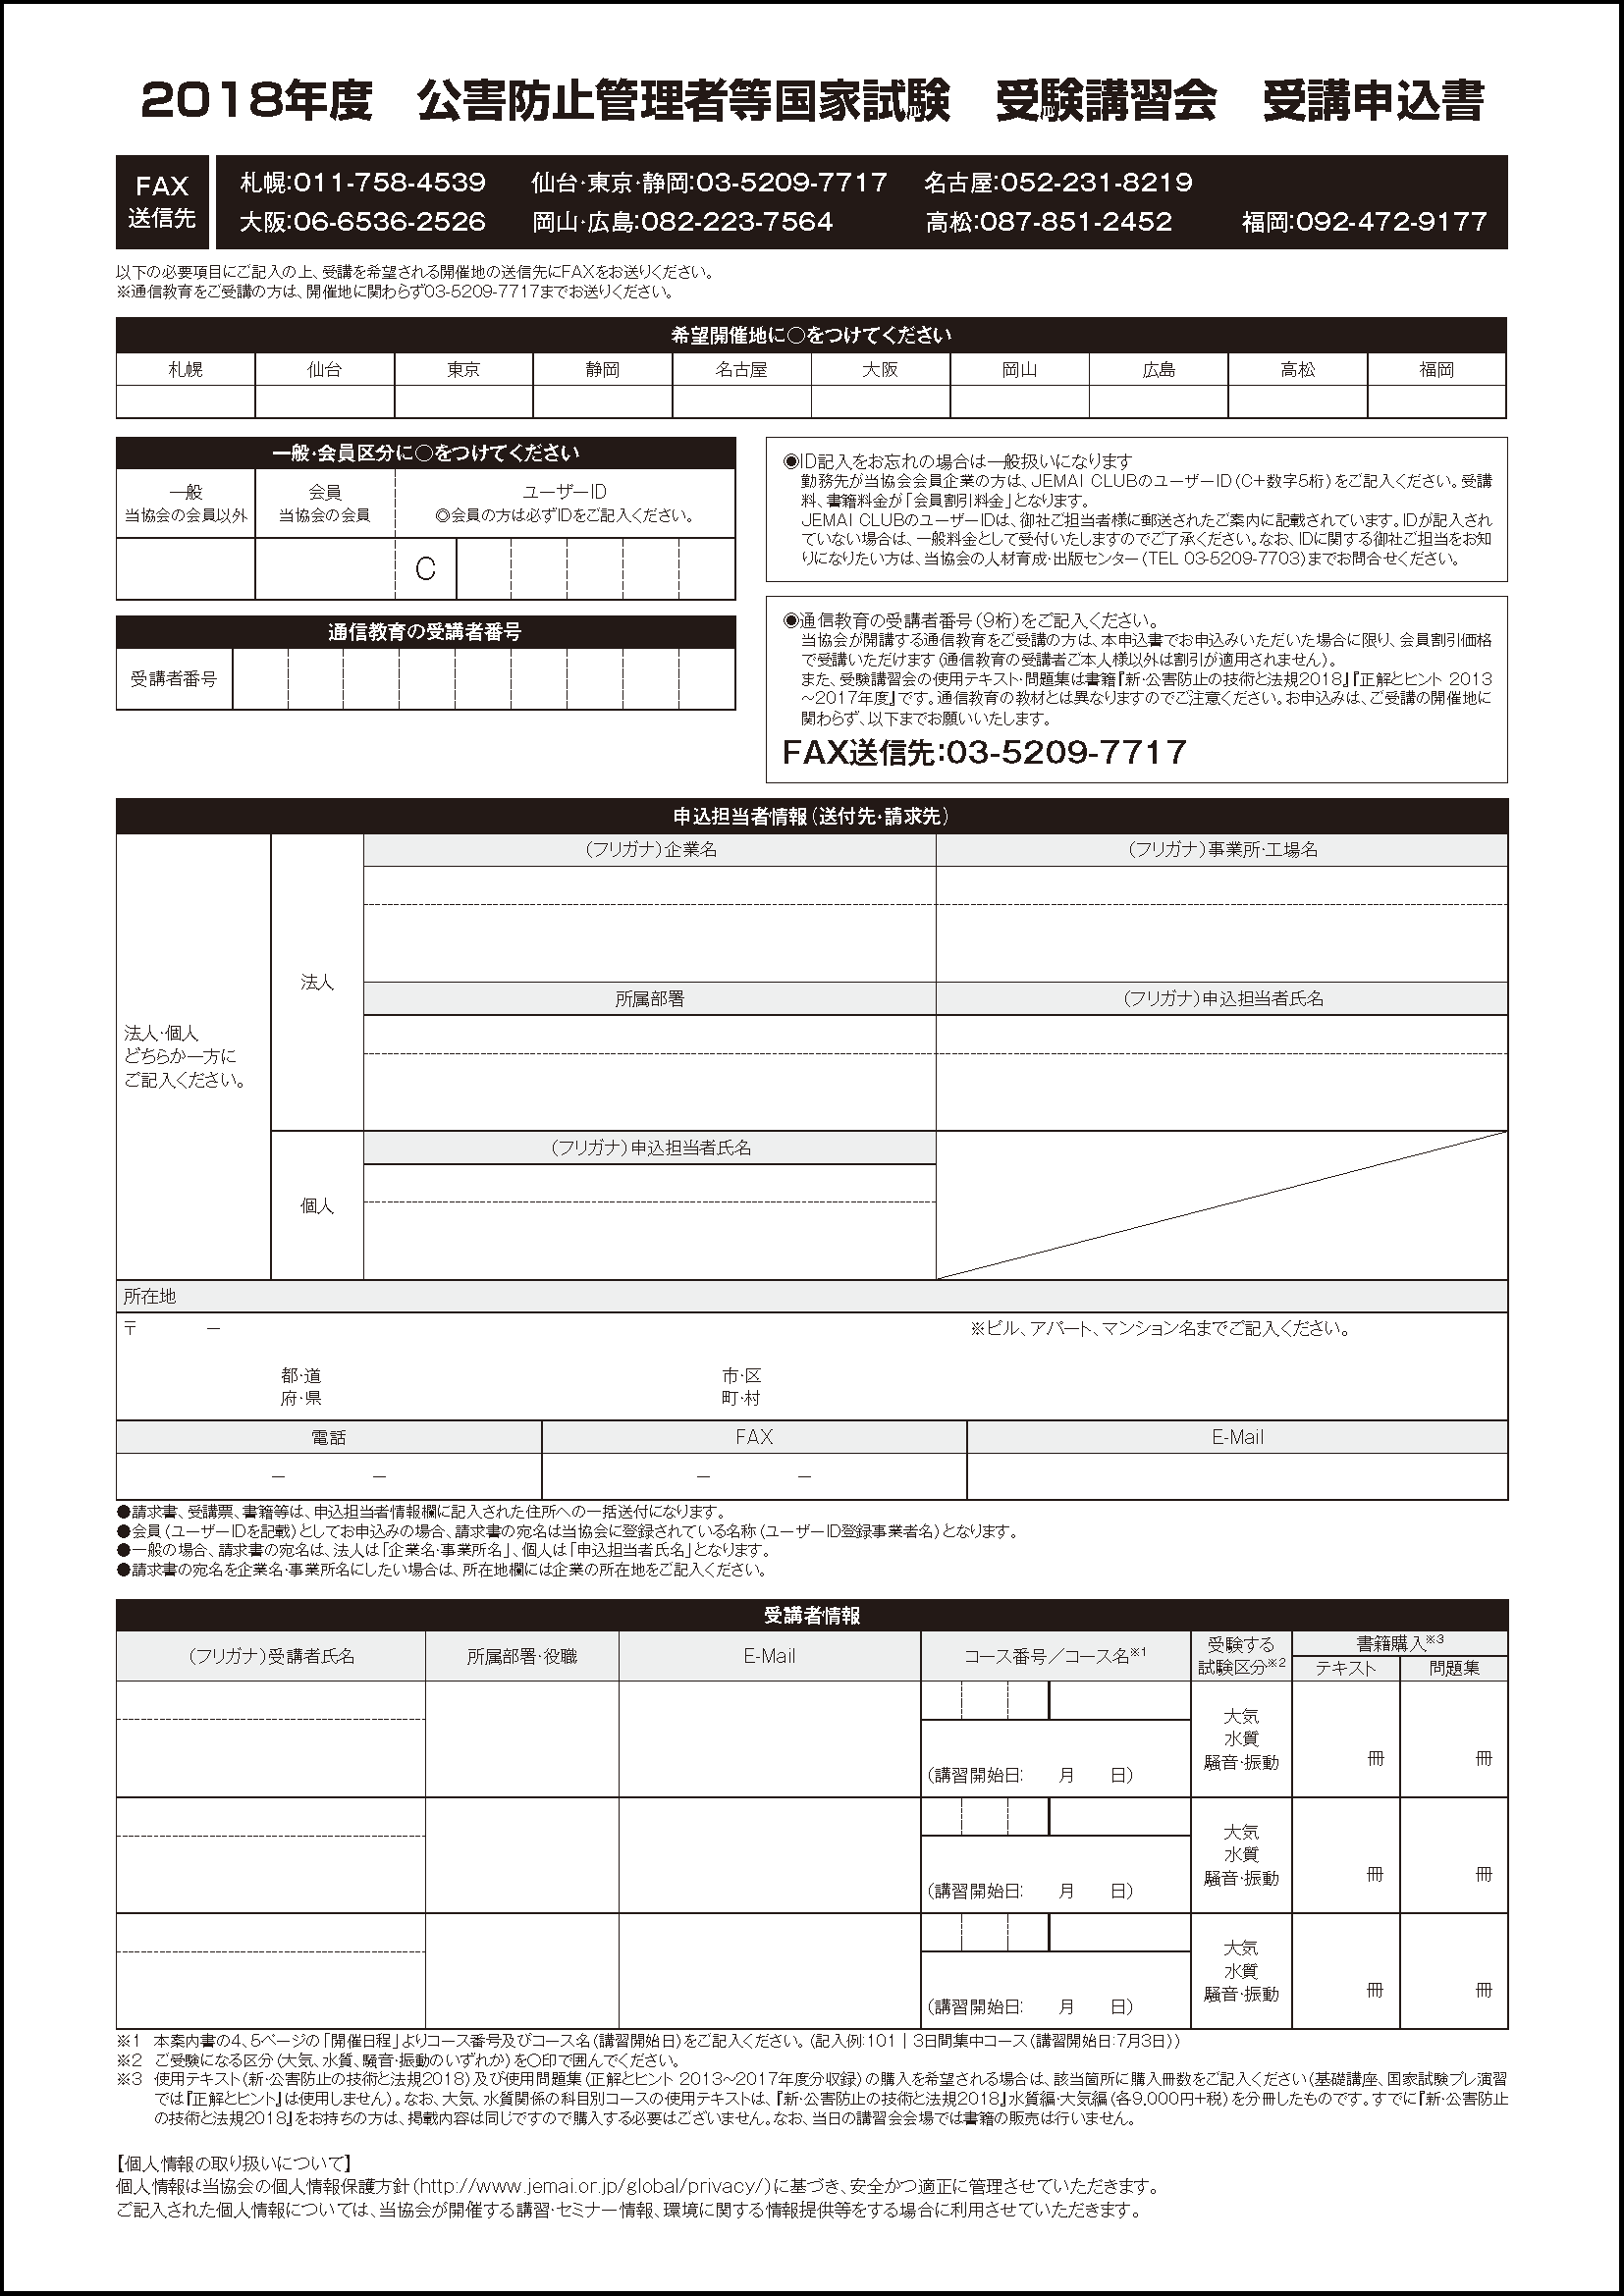 koushu_pamphlet2018_p7.png